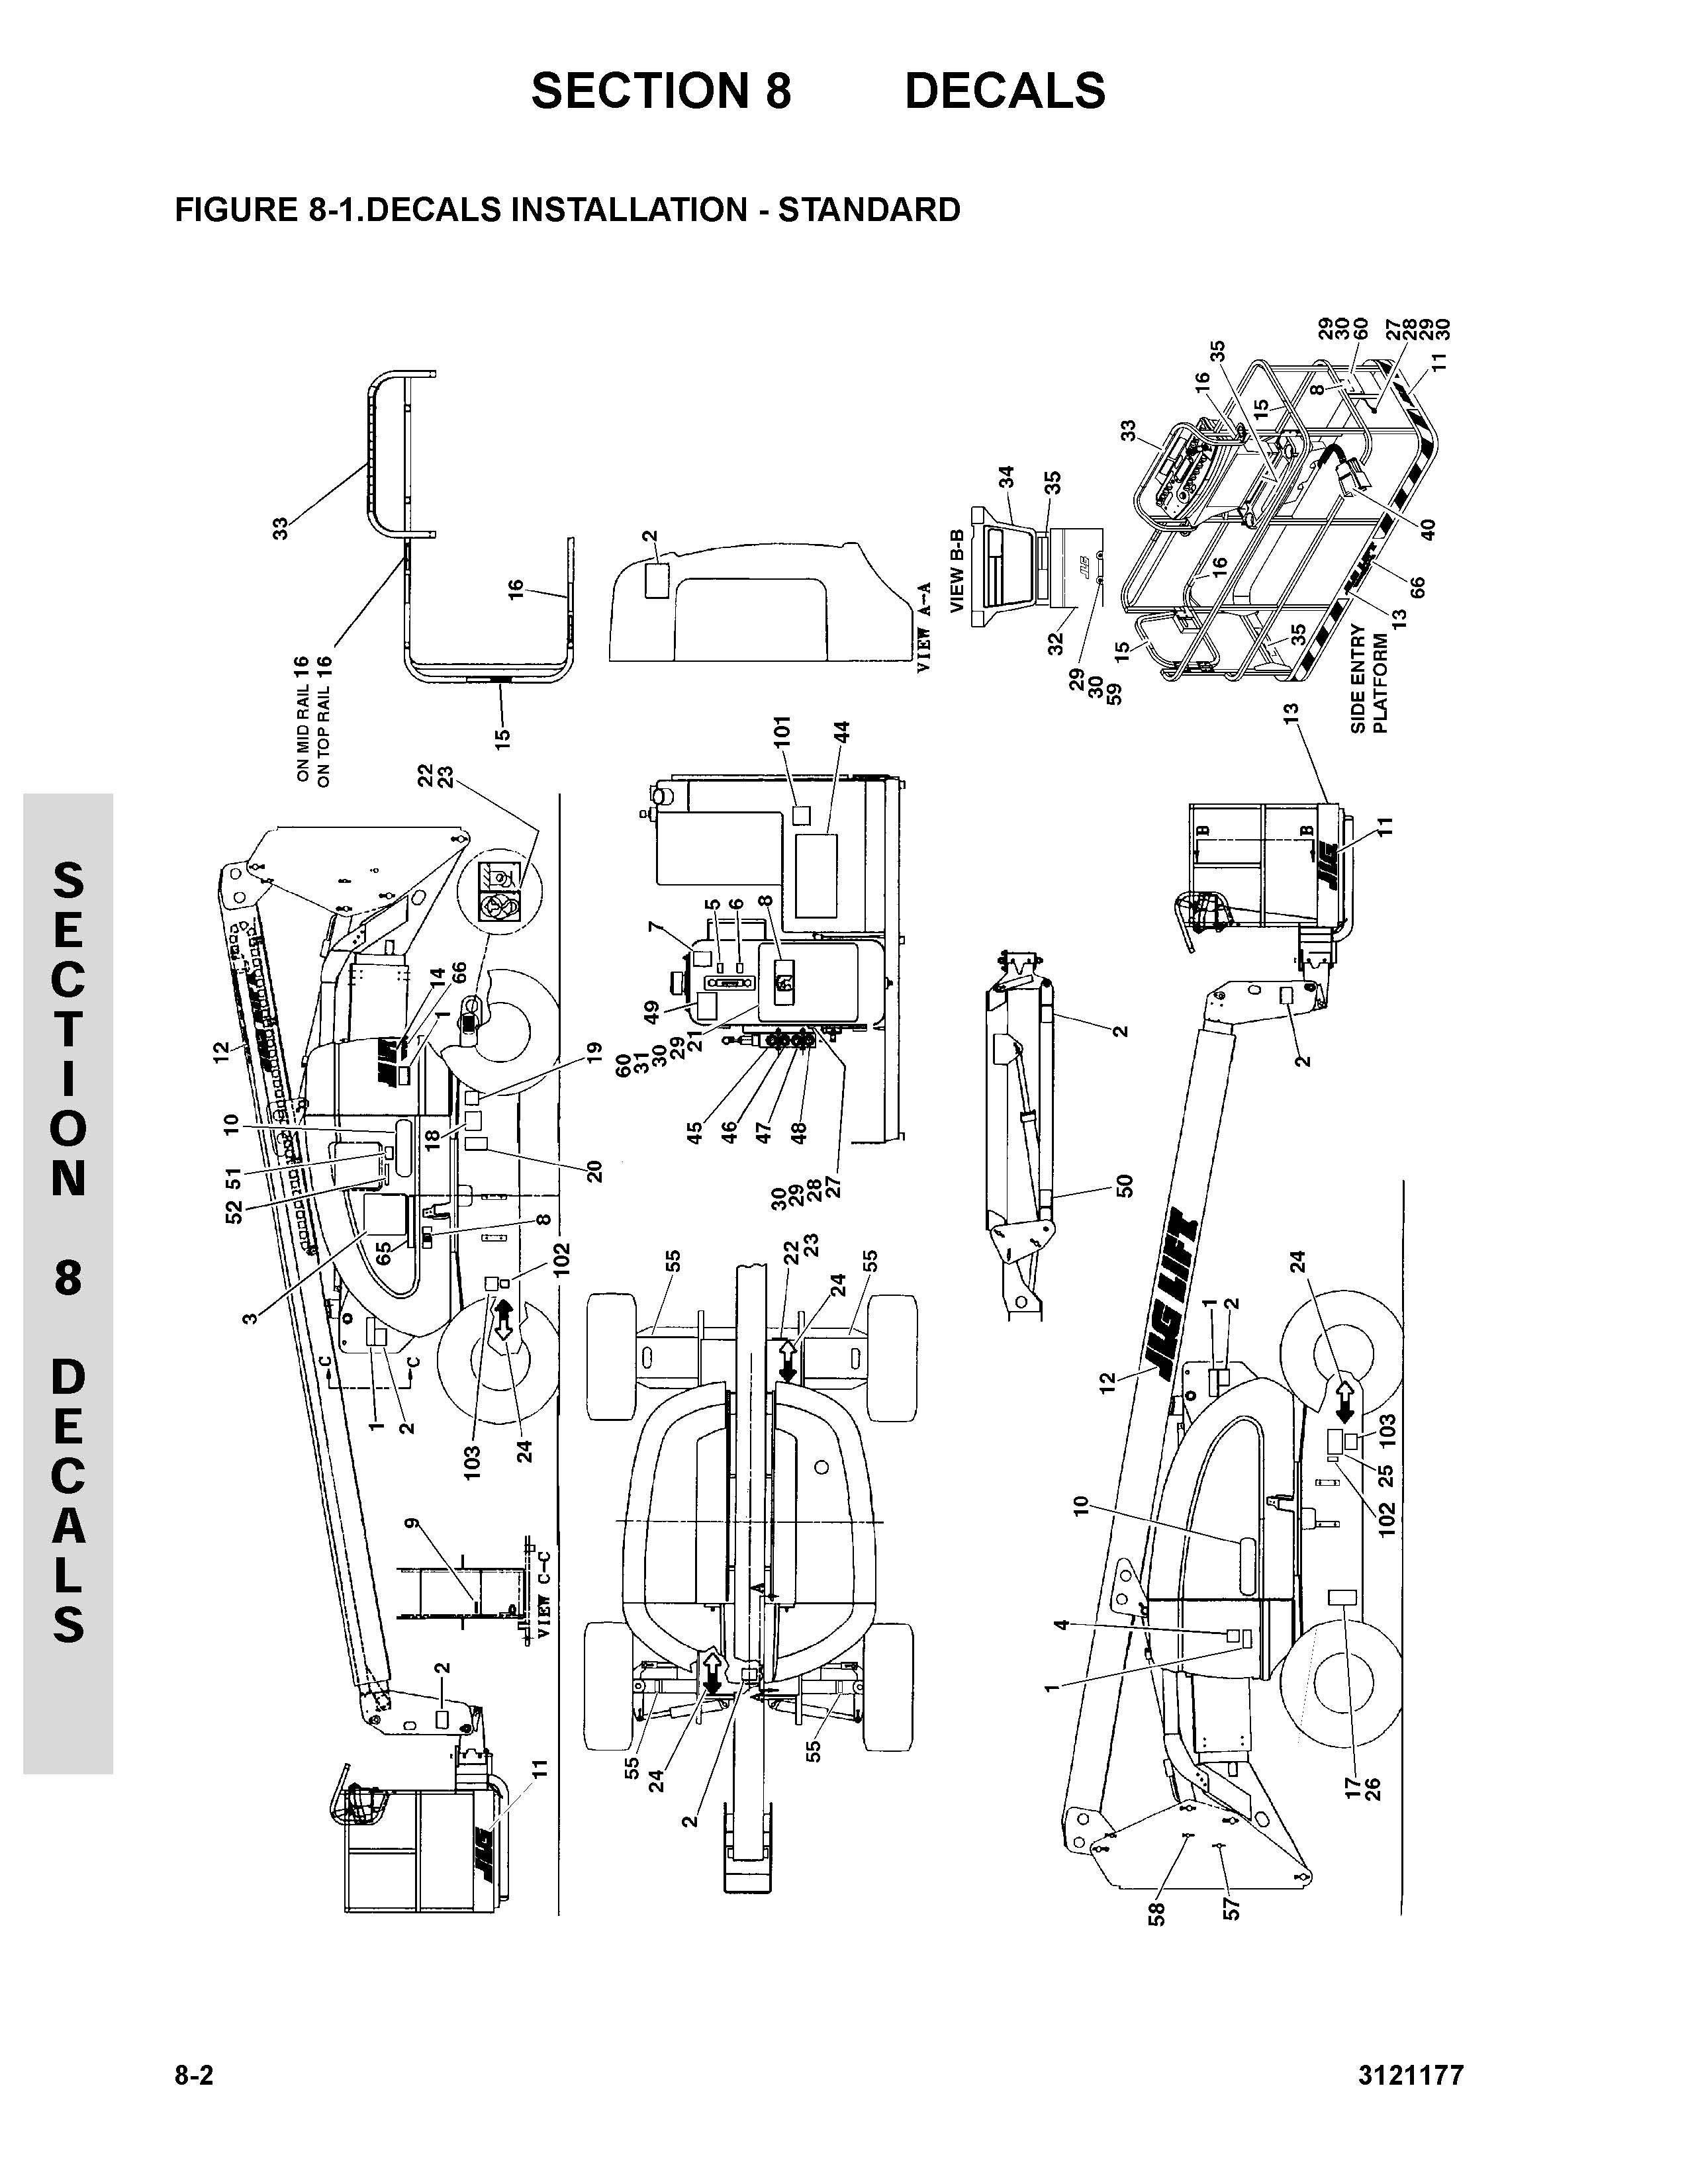 Snorkel Lift Wiring Diagram Unique In 2020 Diagram Wire Scissor Lift